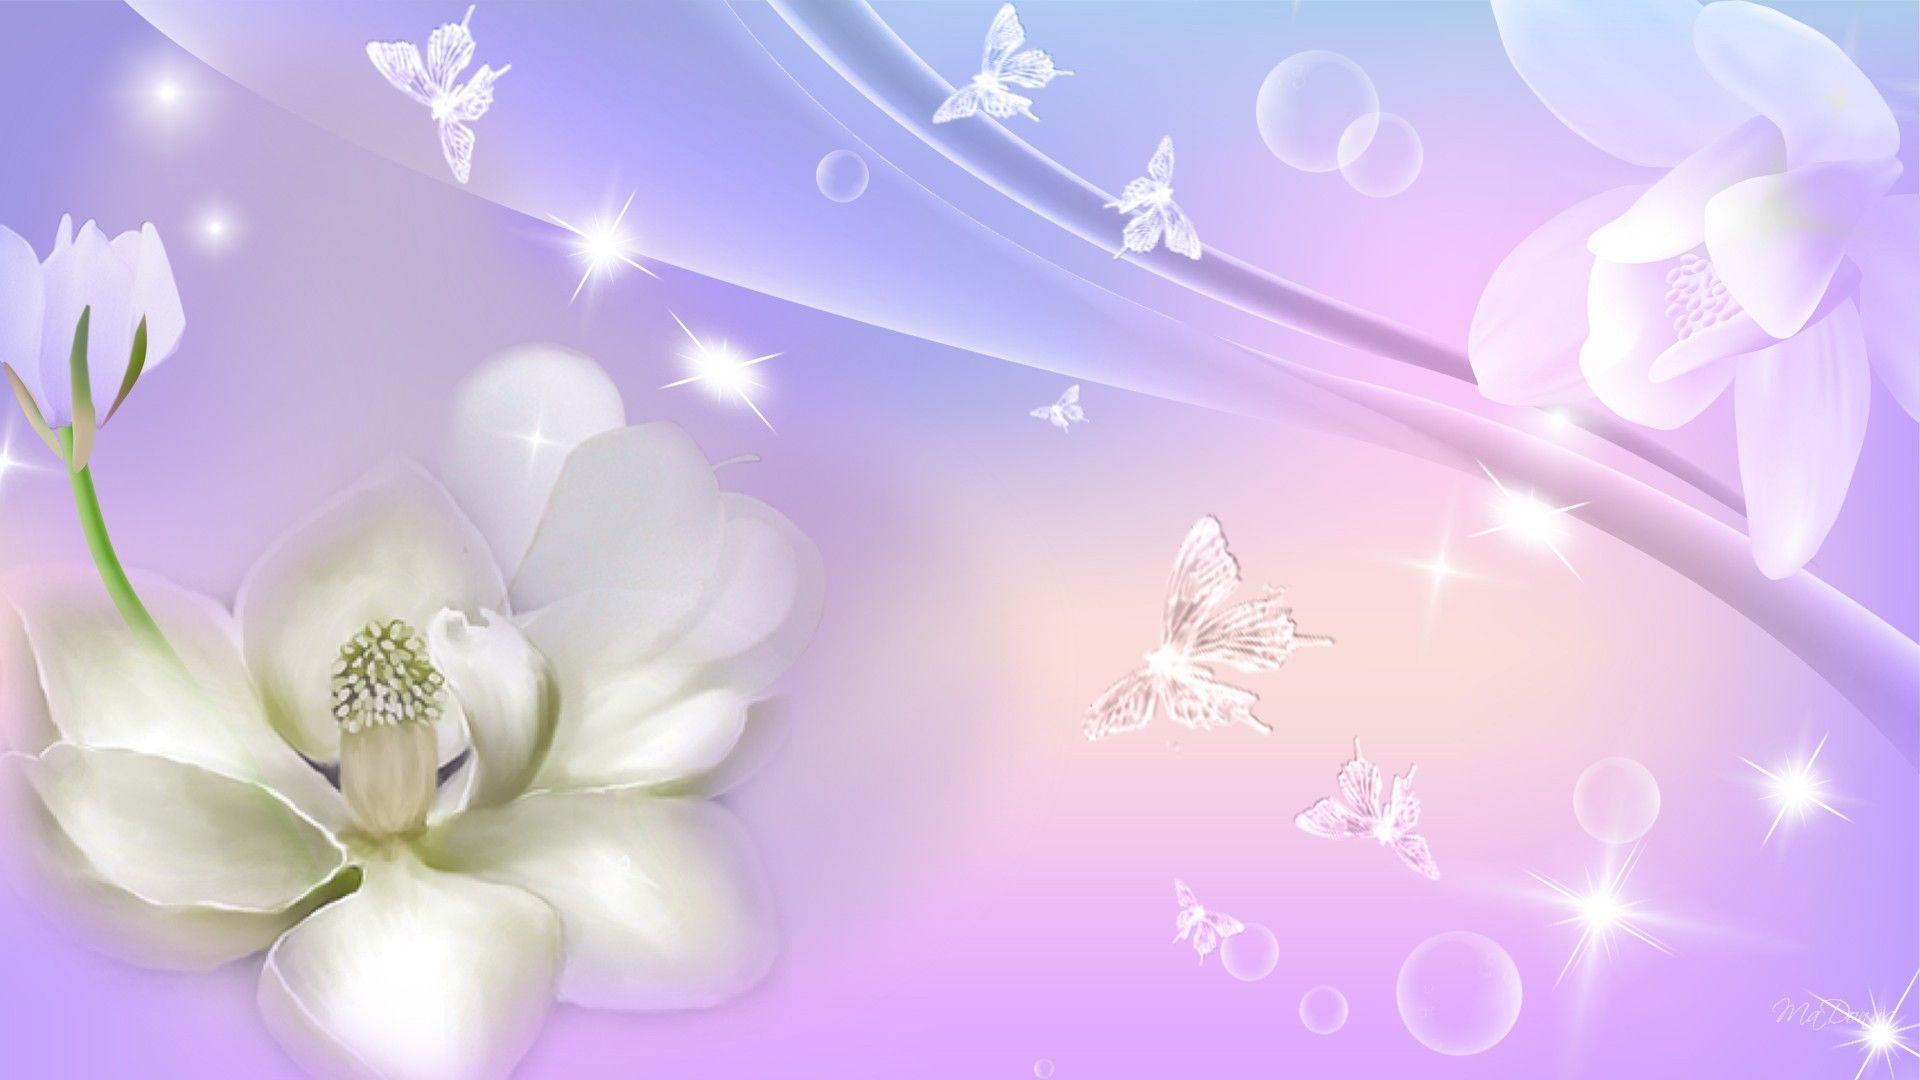 Картинки цветы для слайд-шоу